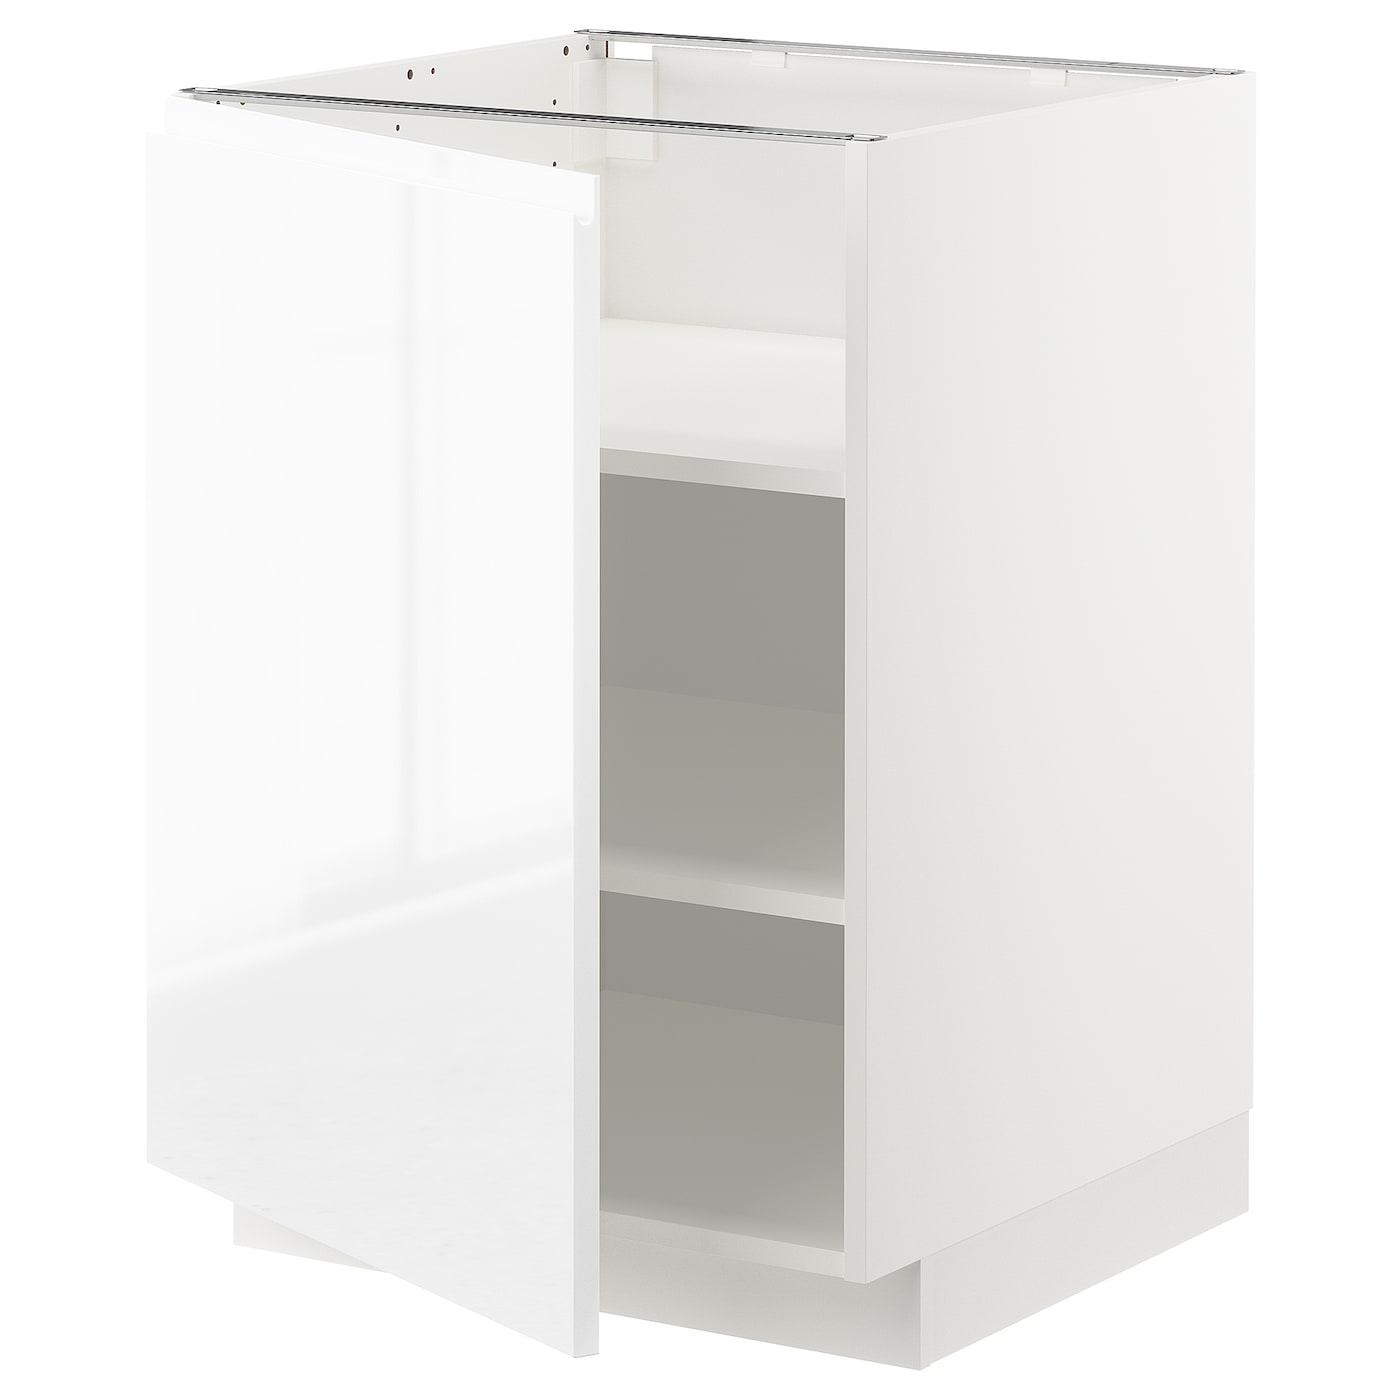 Metod Base Cabinet For Sink Black Järsta Orange 60x60 Cm: METOD Base Cabinet With Shelves White Voxtorp/high-gloss